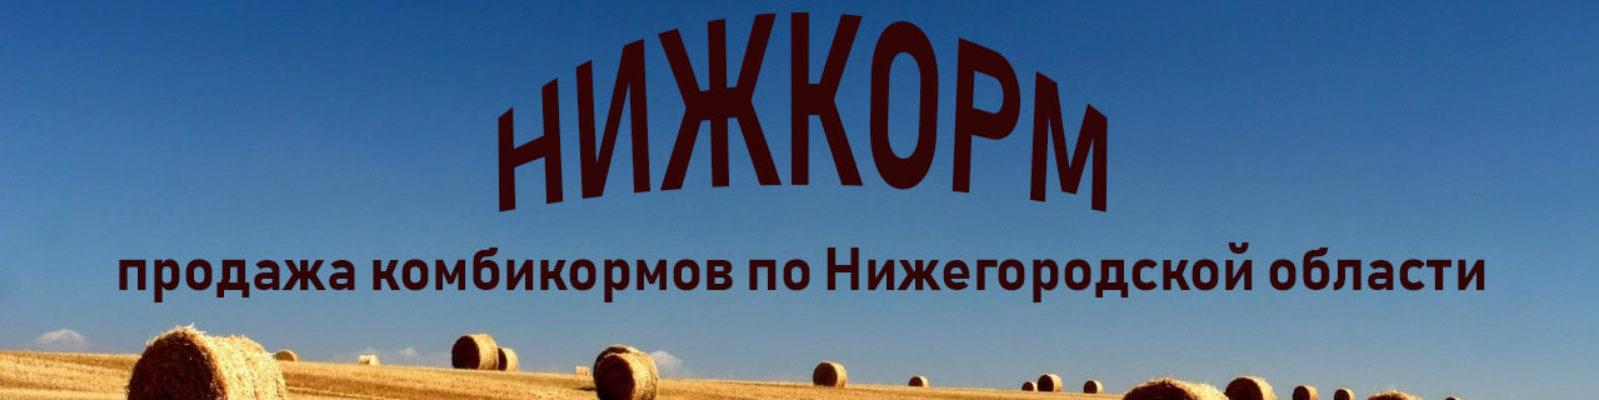 cropped-cropped-2fons.ru-24579-1